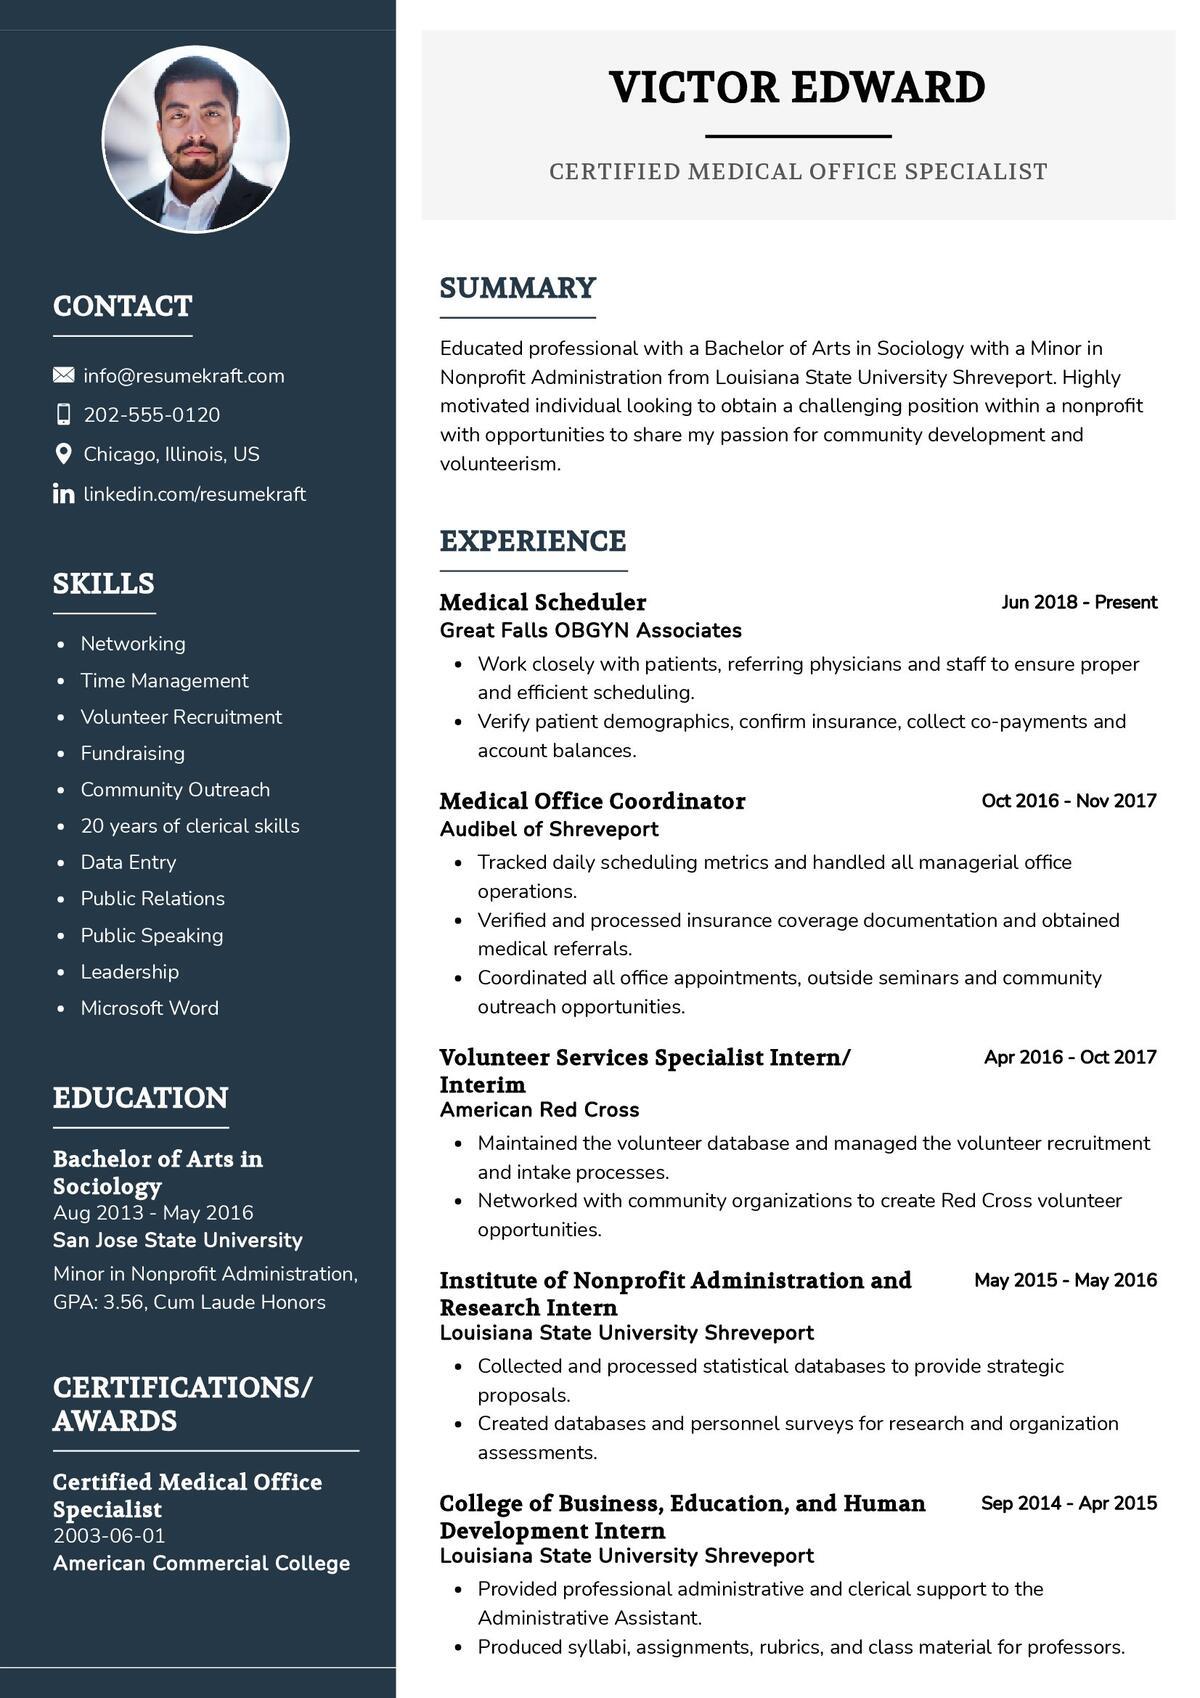 Medical Office Specialist CV Example